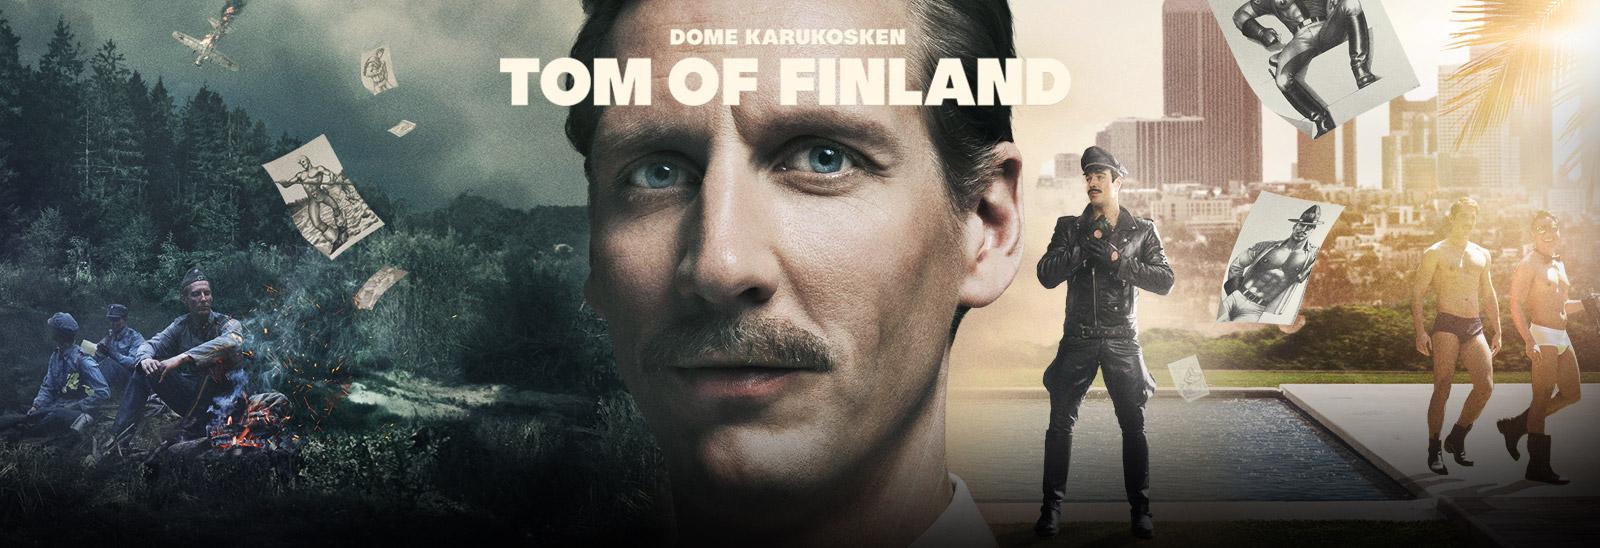 Tom of Finland -elokuva on ihmisoikeusteko - Amnesty